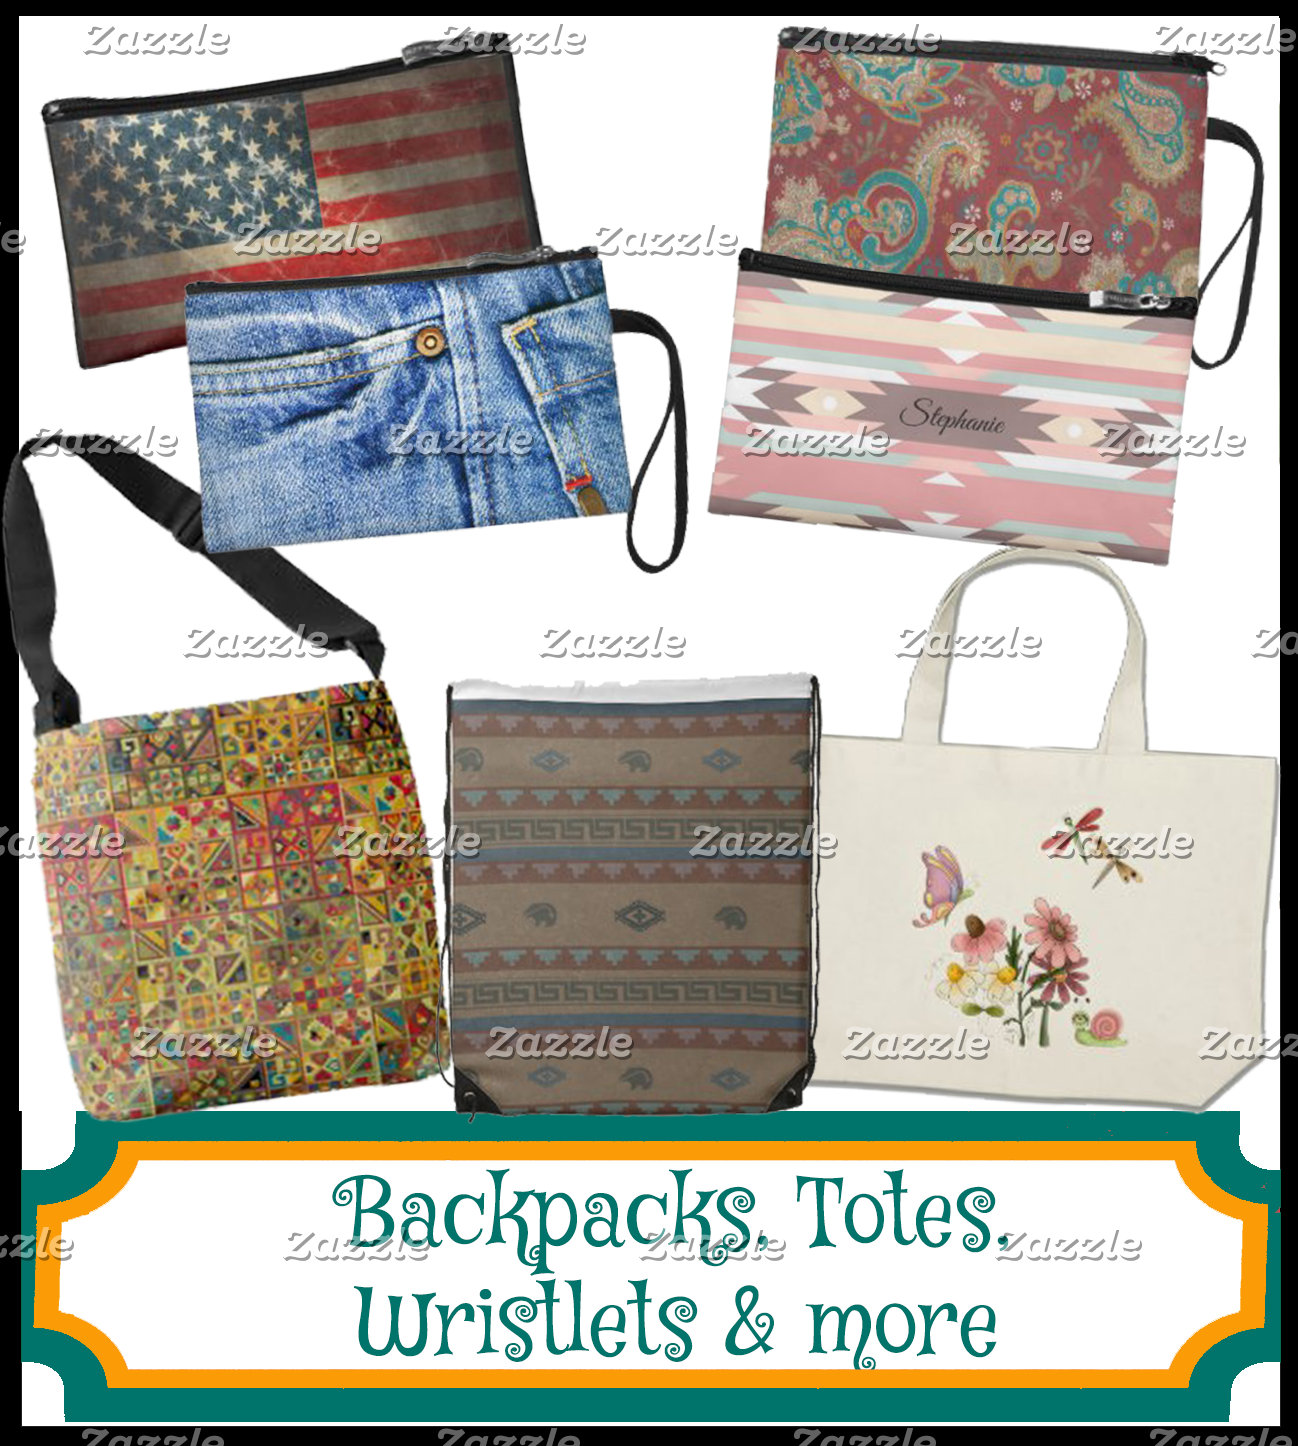 BACKPACKS, TOTES, WRISTLETS & MORE